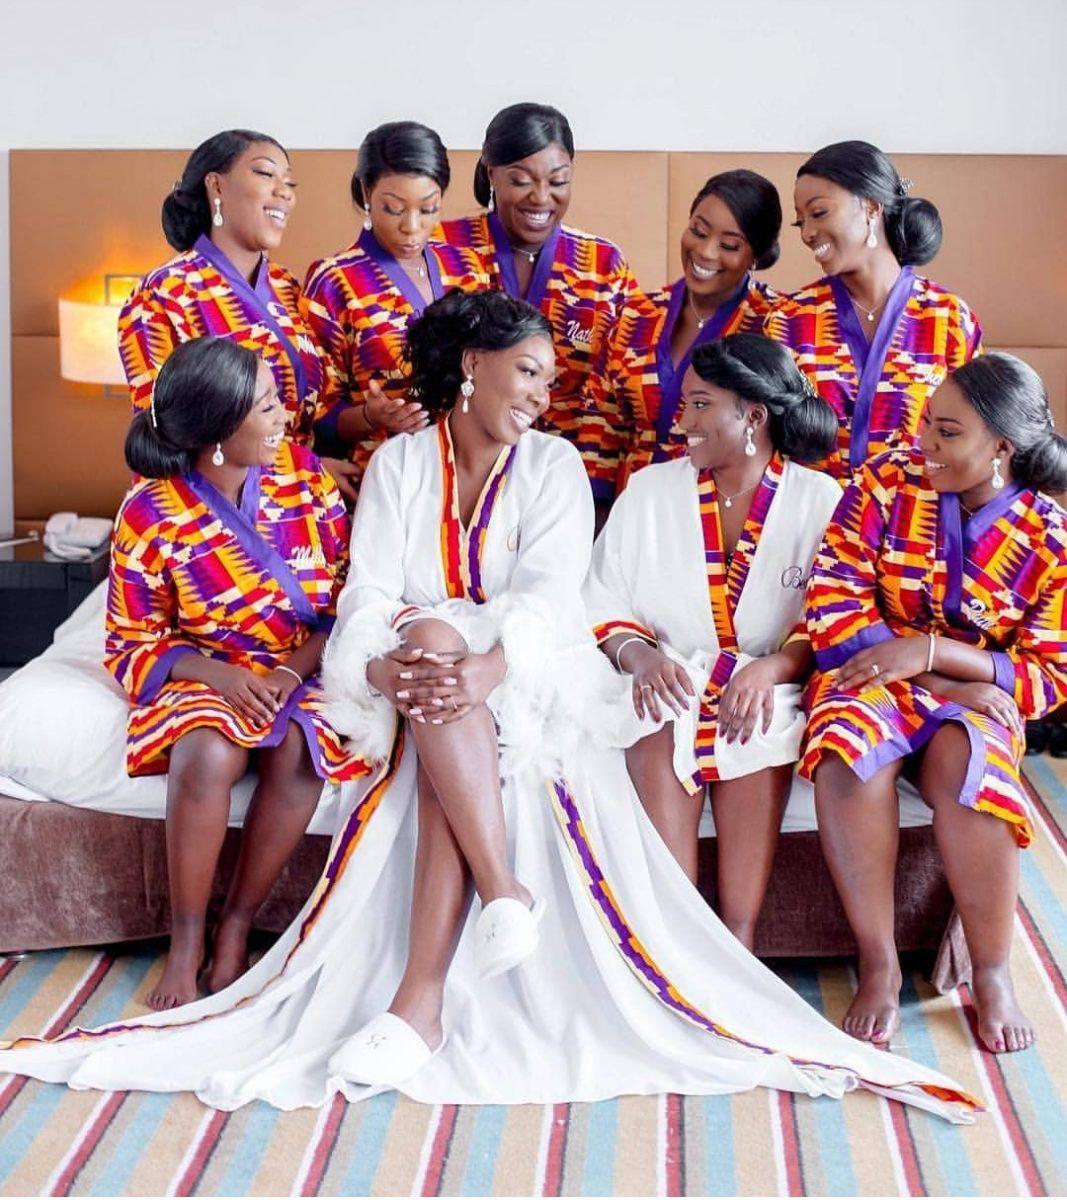 Beautiful Ankara Styles For Bridal Shower 2020 Isishweshwe In 2020 African Bridal Dress African Traditional Wedding Dress African Bridesmaid Dresses